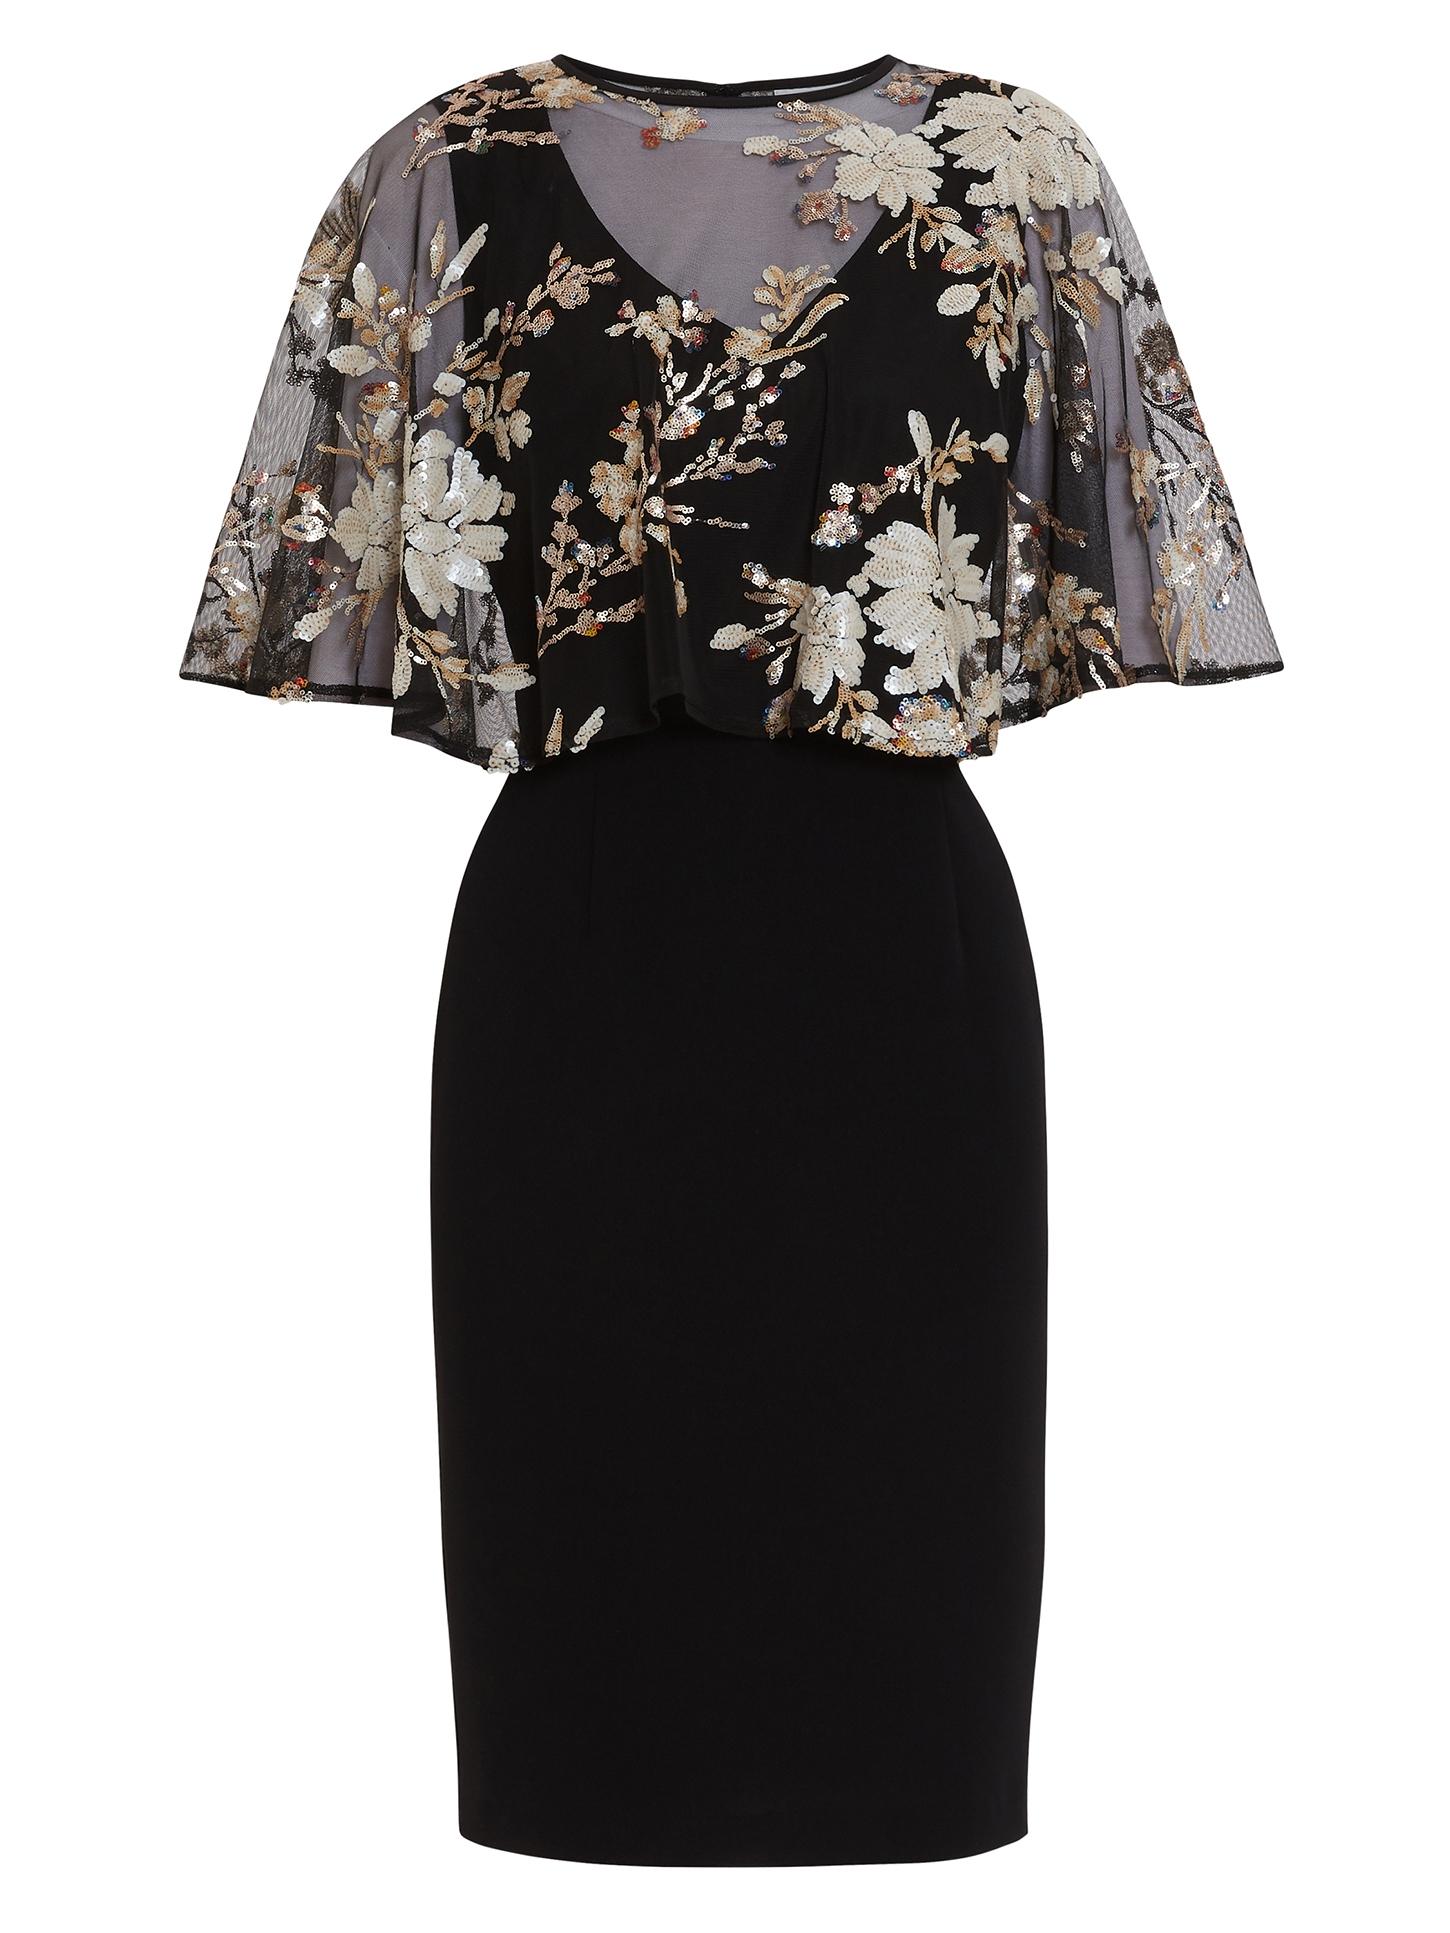 Coranne Sequin Cape Dress